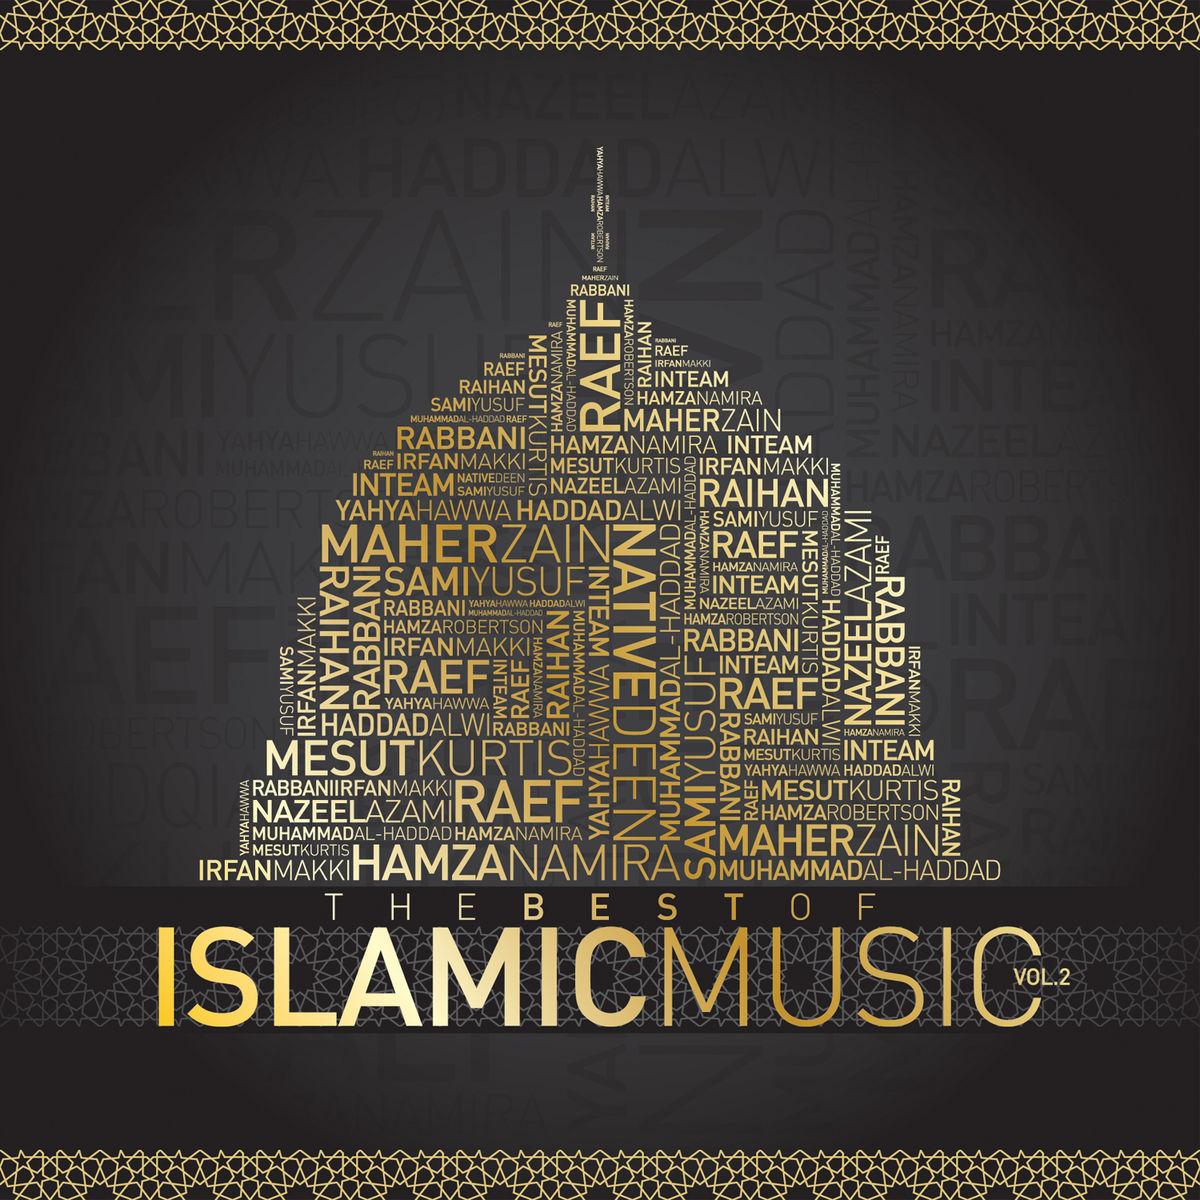 Various Artists - The Best Of Islamic Music, Vol. 2 Album